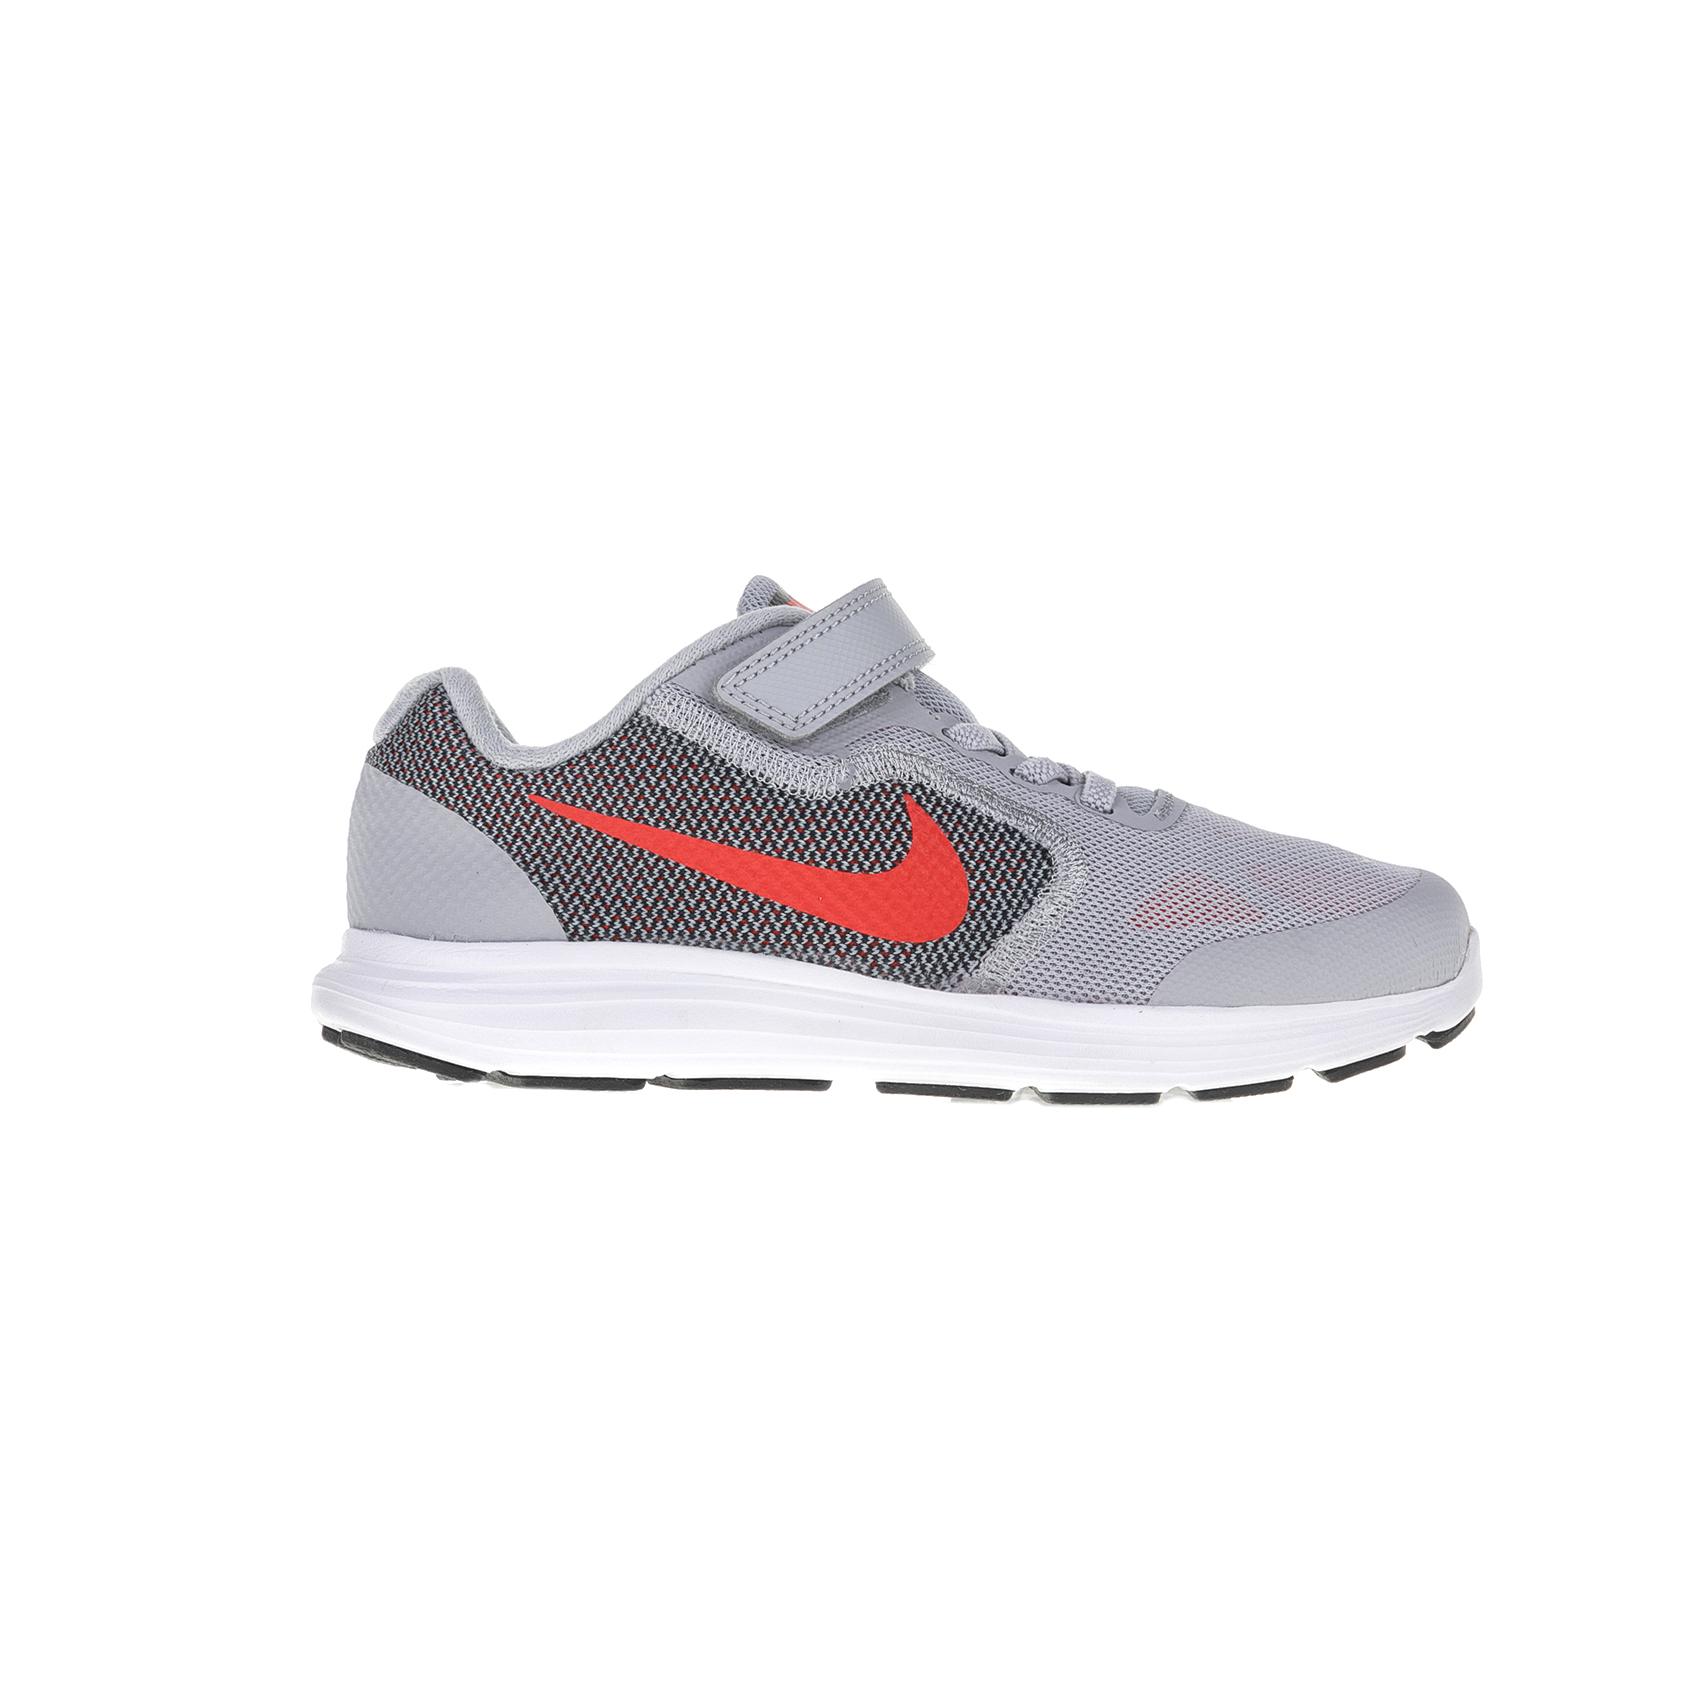 NIKE – Παιδικά αθλητικά παπούτσια Nike REVOLUTION 3 (PSV) γκρι